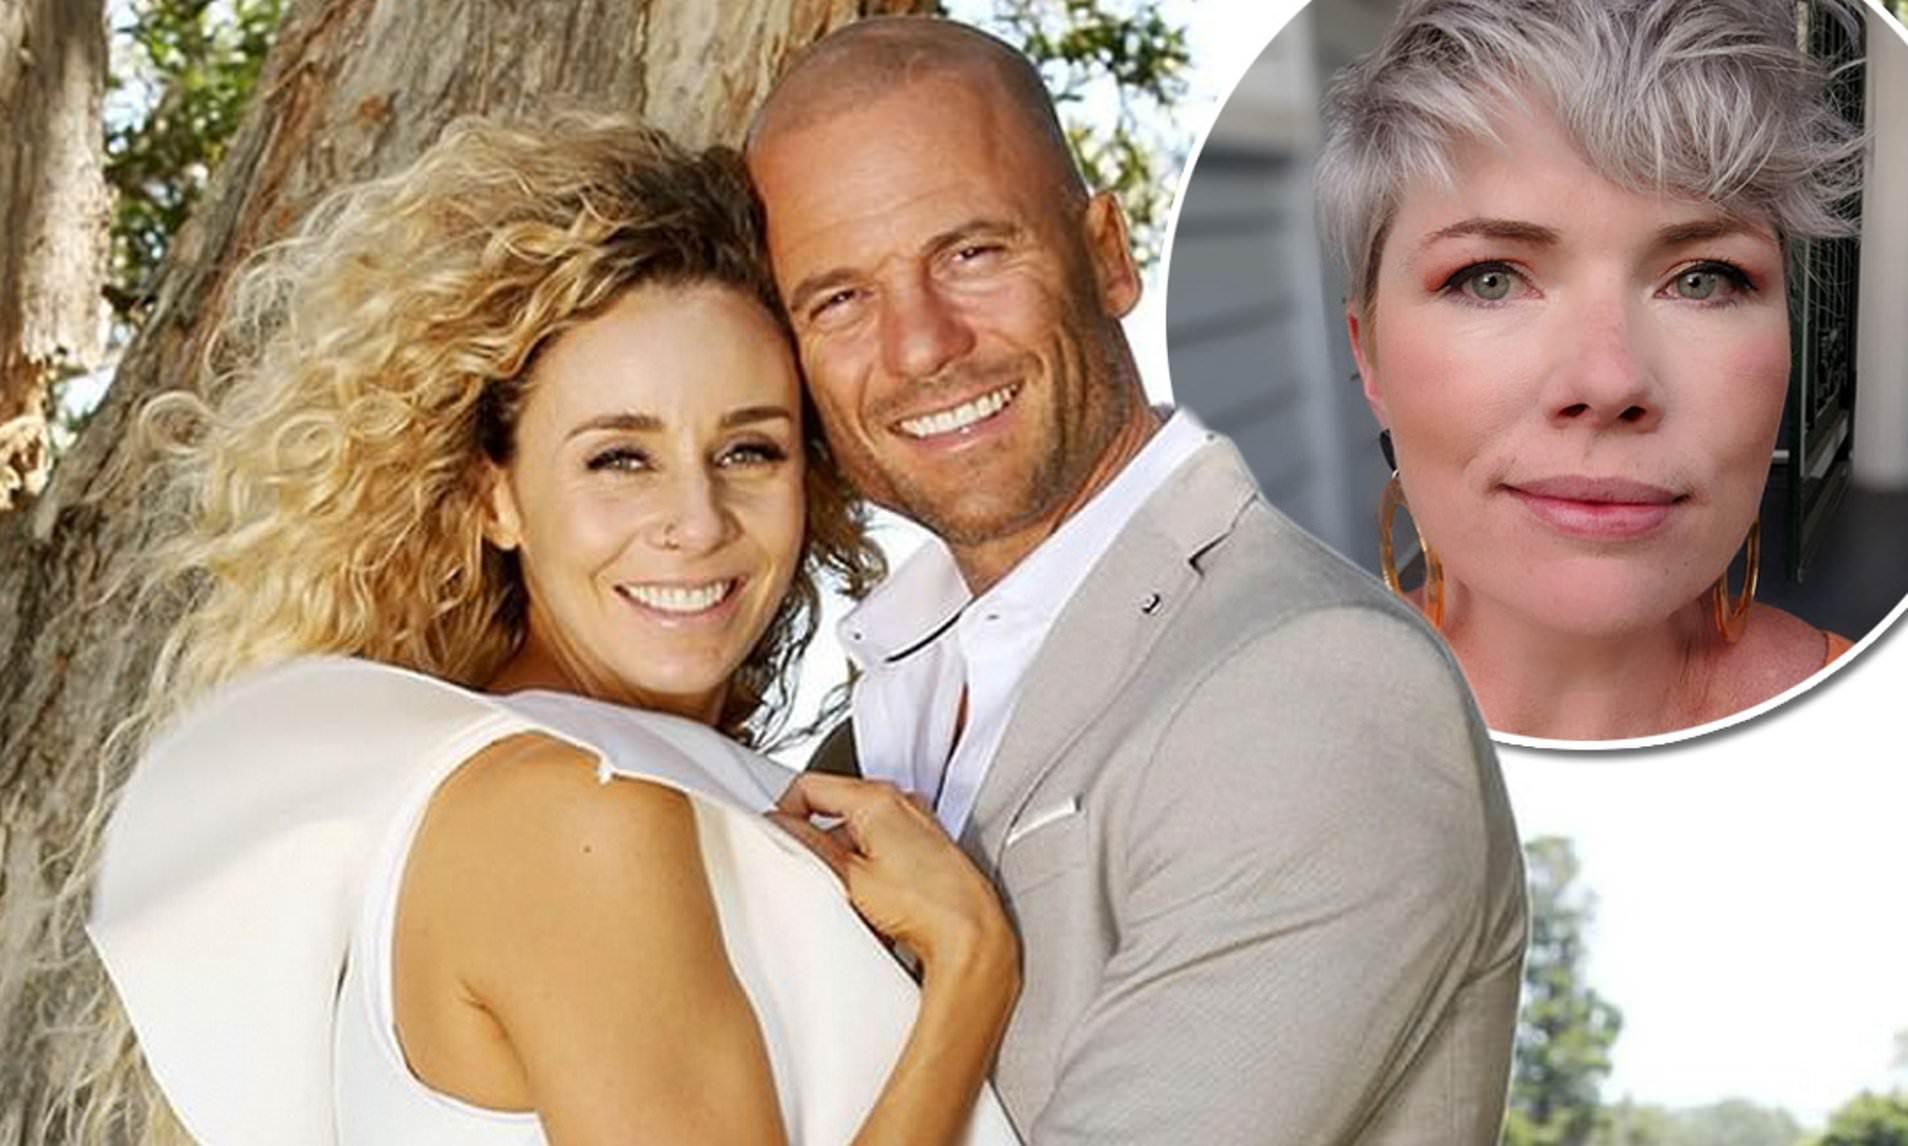 Married At First Sight Star Mike Gunner Got Into A Bitter